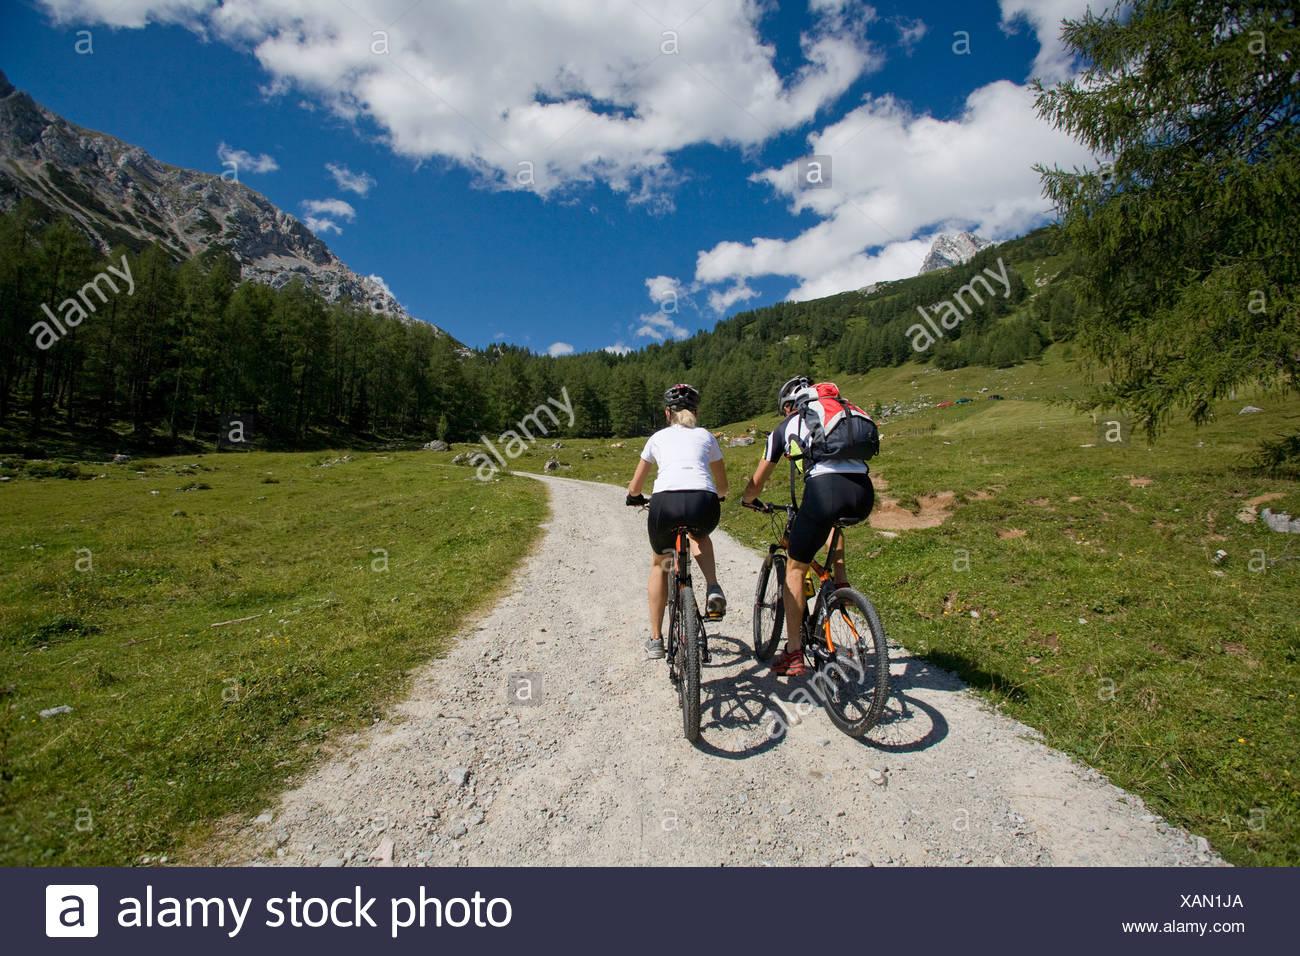 Bike Austria Filzmoos Salzburg summer alp mountain alps alpine mountains landscape scenery nature Bicycle Bicycles Bicycling - Stock Image